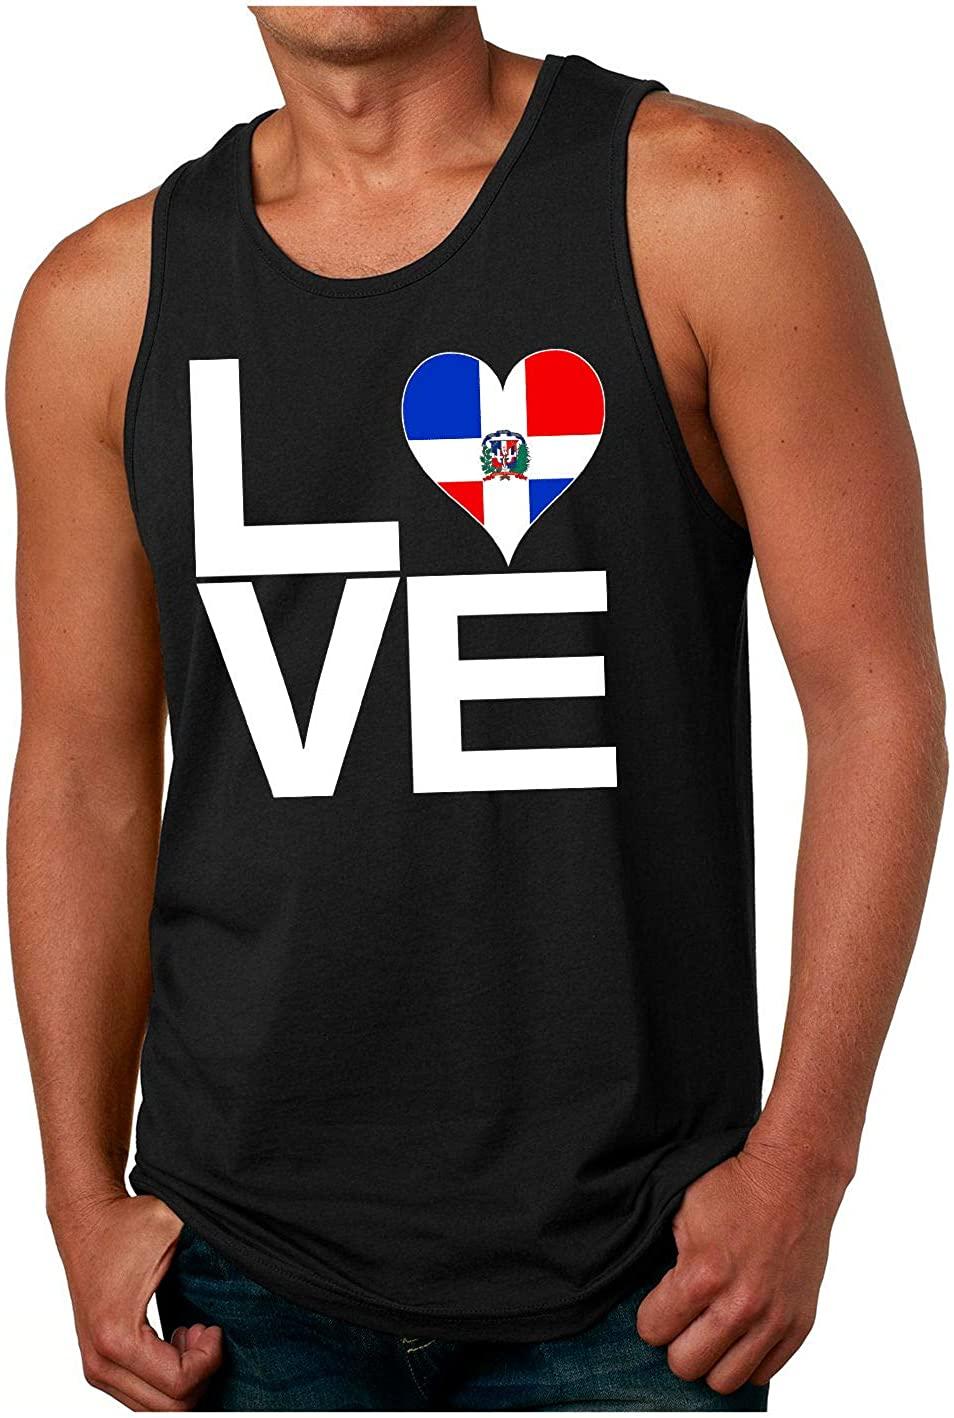 HARD EDGE DESIGN Men's Love Block Dominican Republic Heart Tank Top, Small, Black